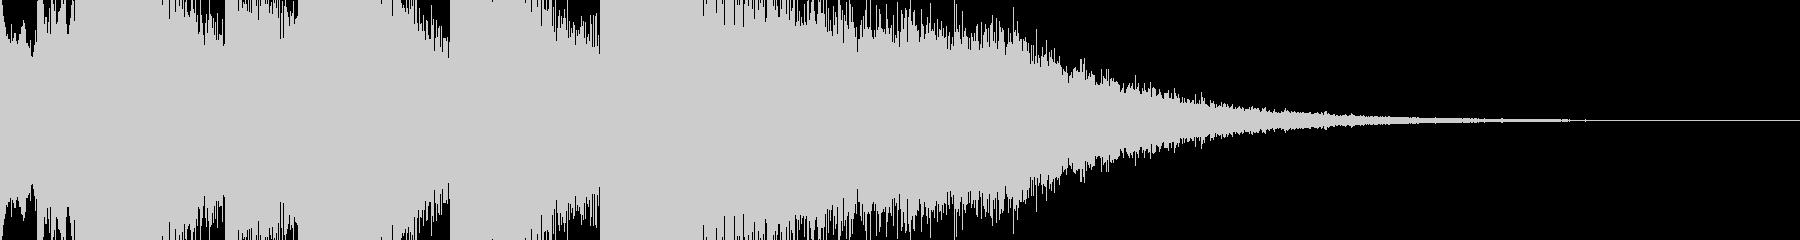 Title sound / scene change for video production ♪'s unreproduced waveform